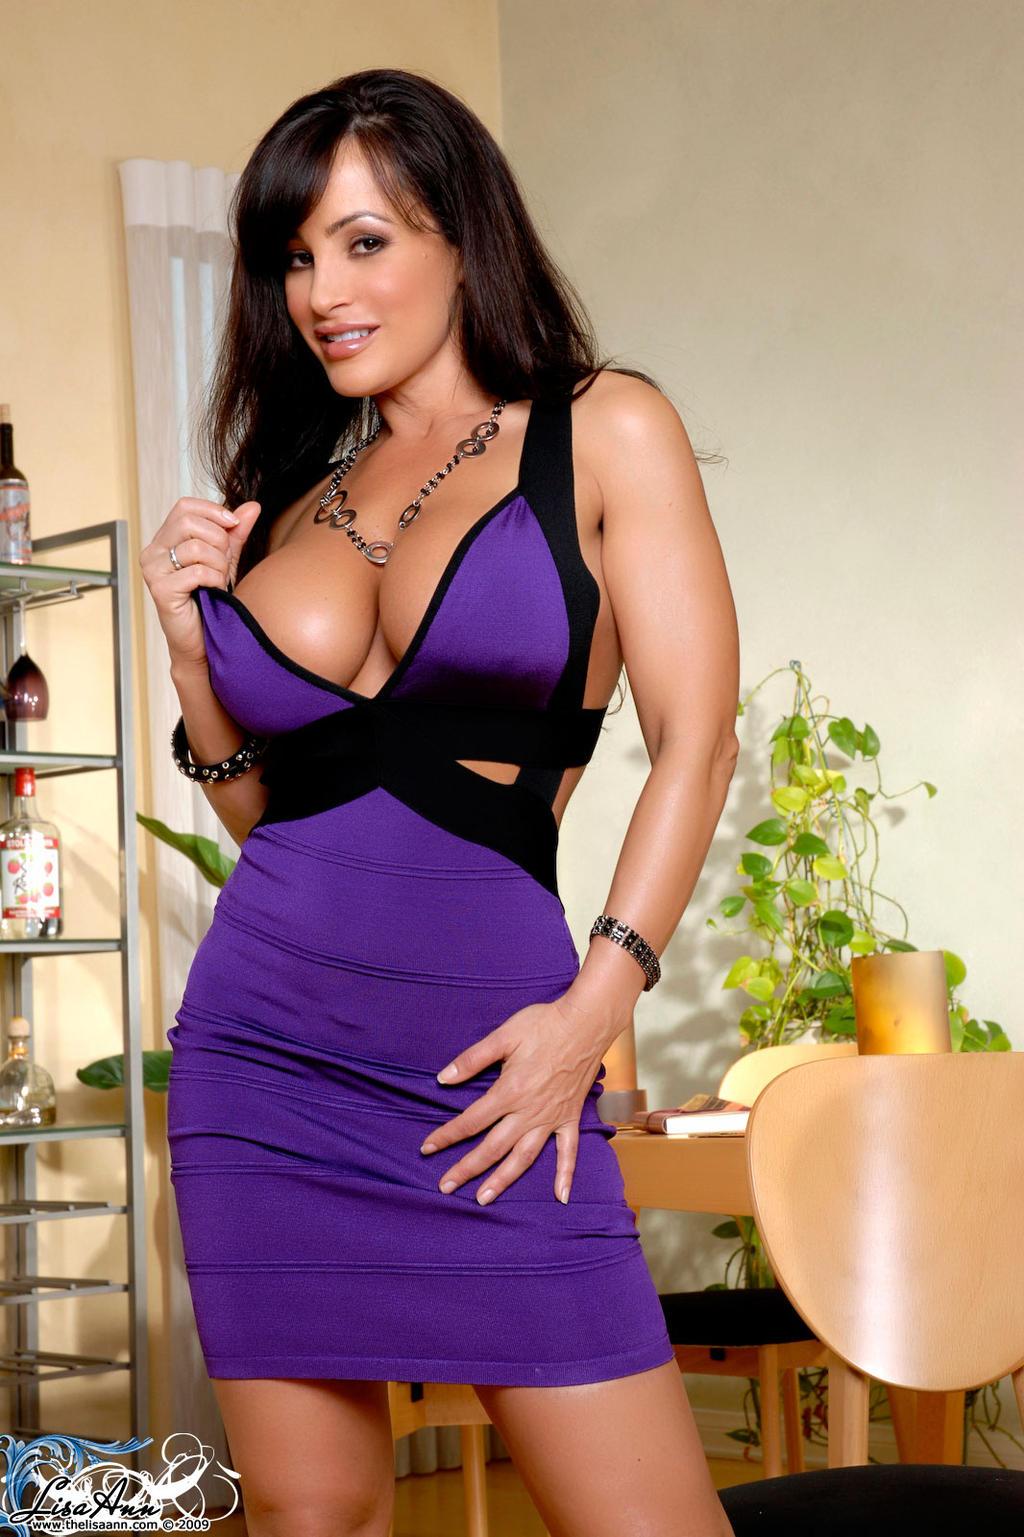 Lisa Ann Purple by k1ngxx